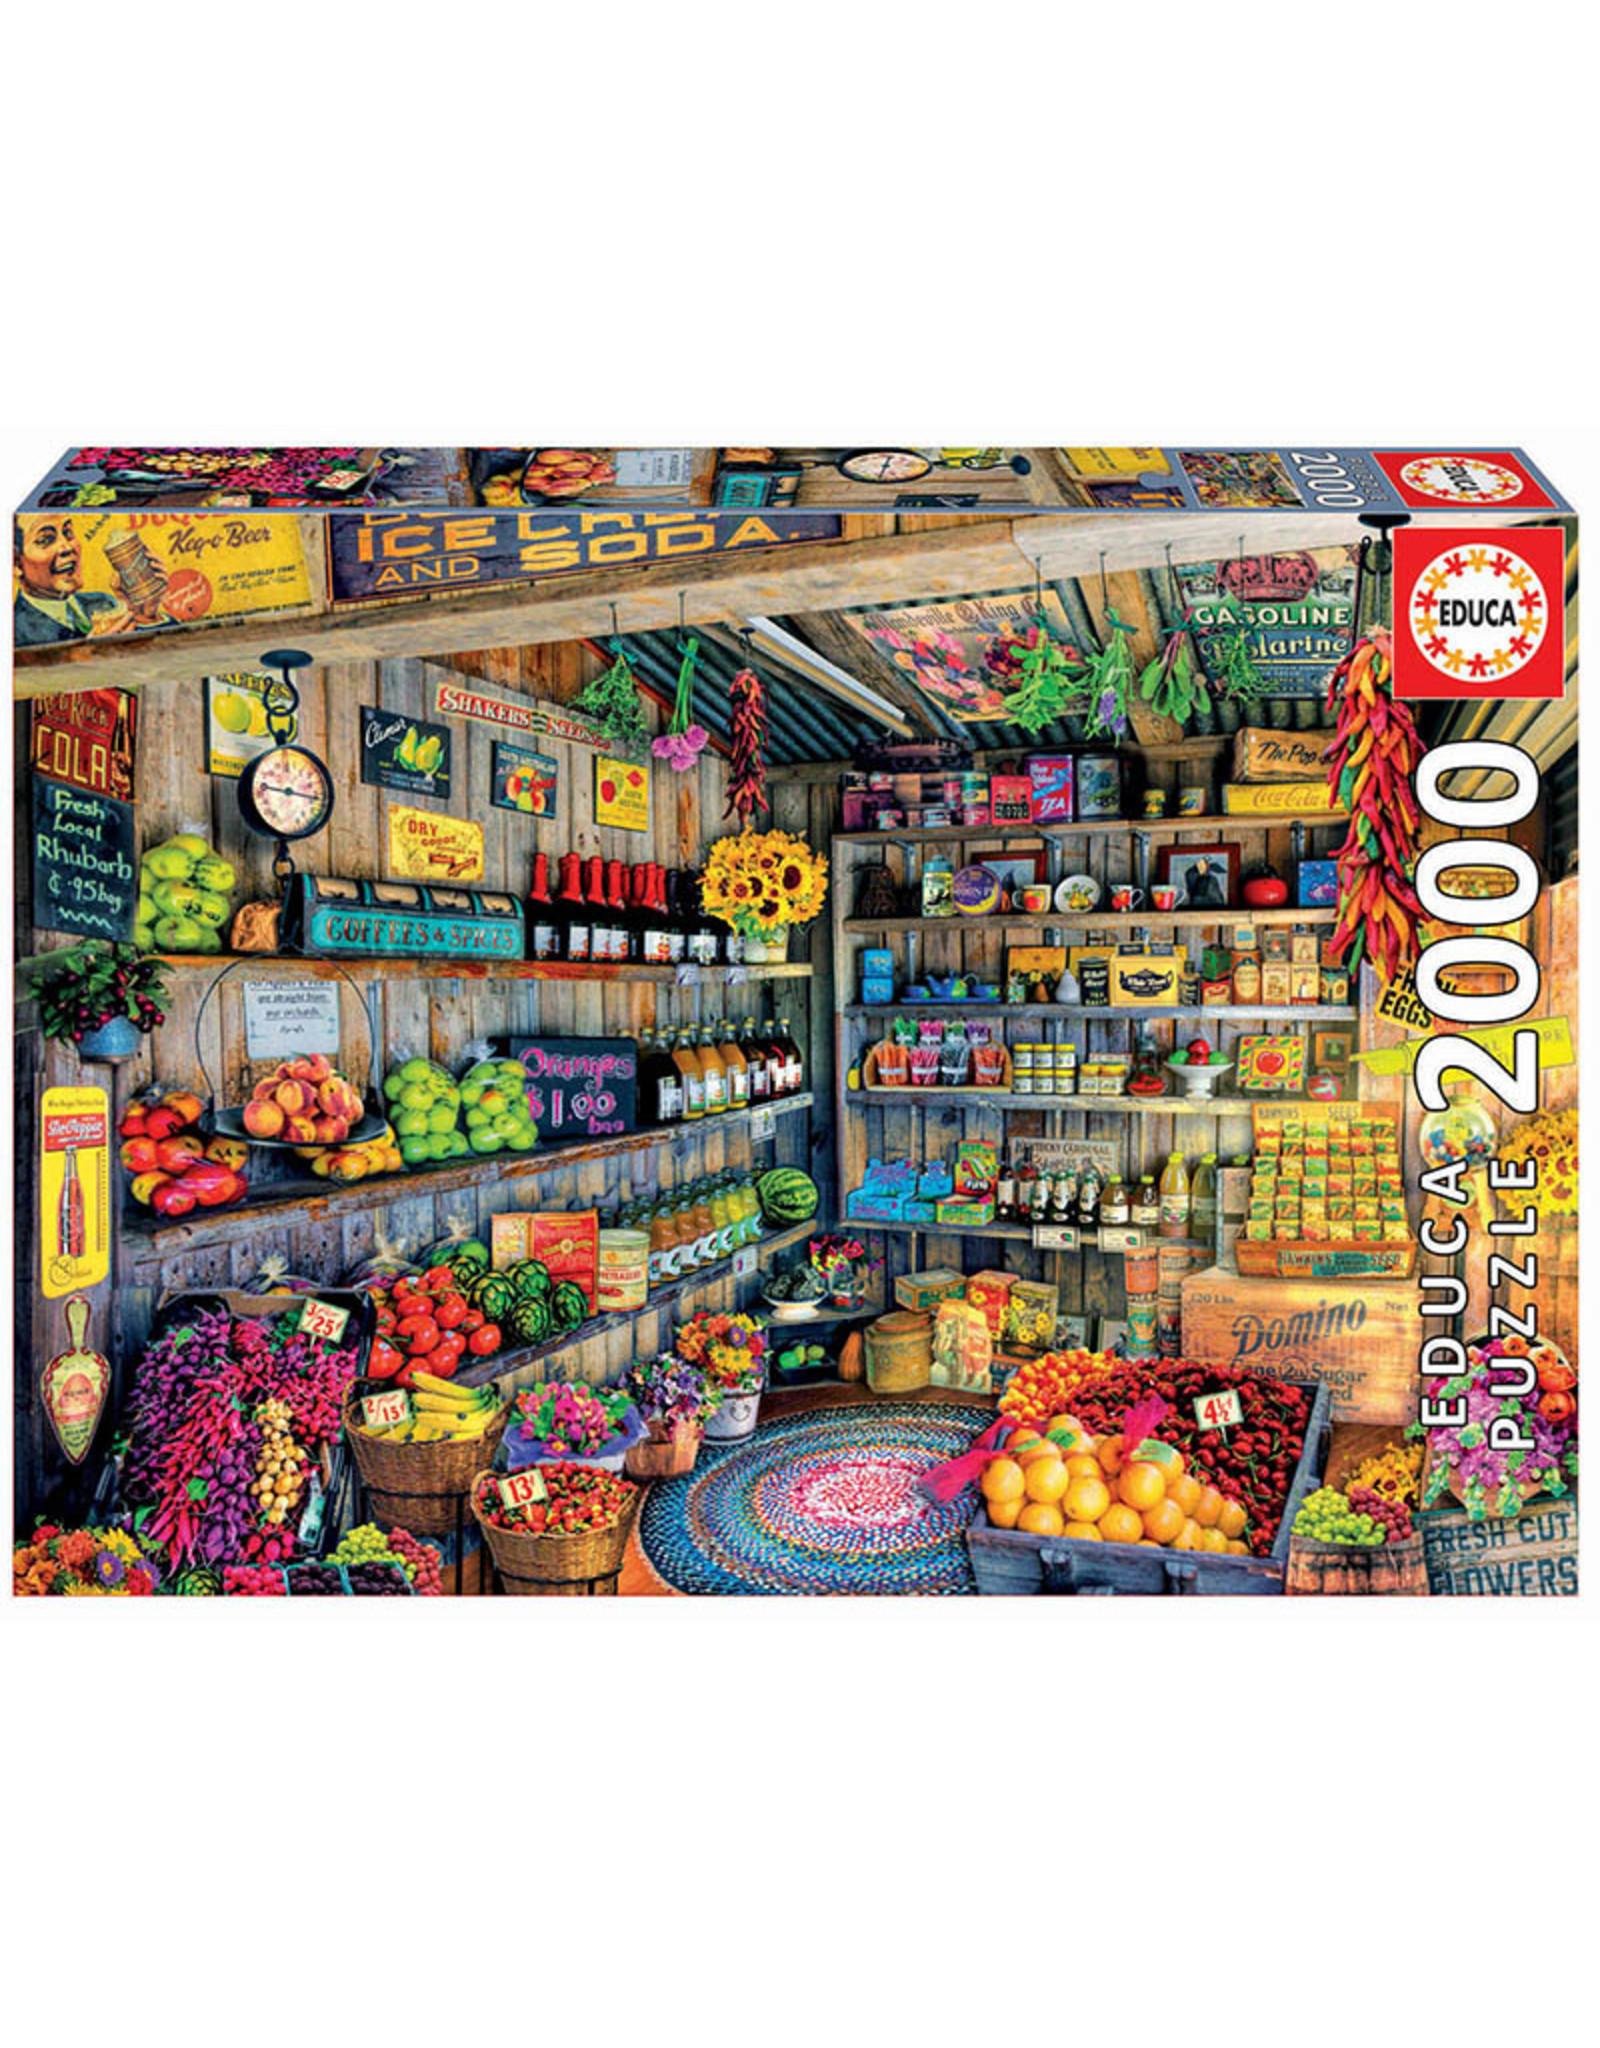 Educa The Farmers Market 2000pc Puzzle